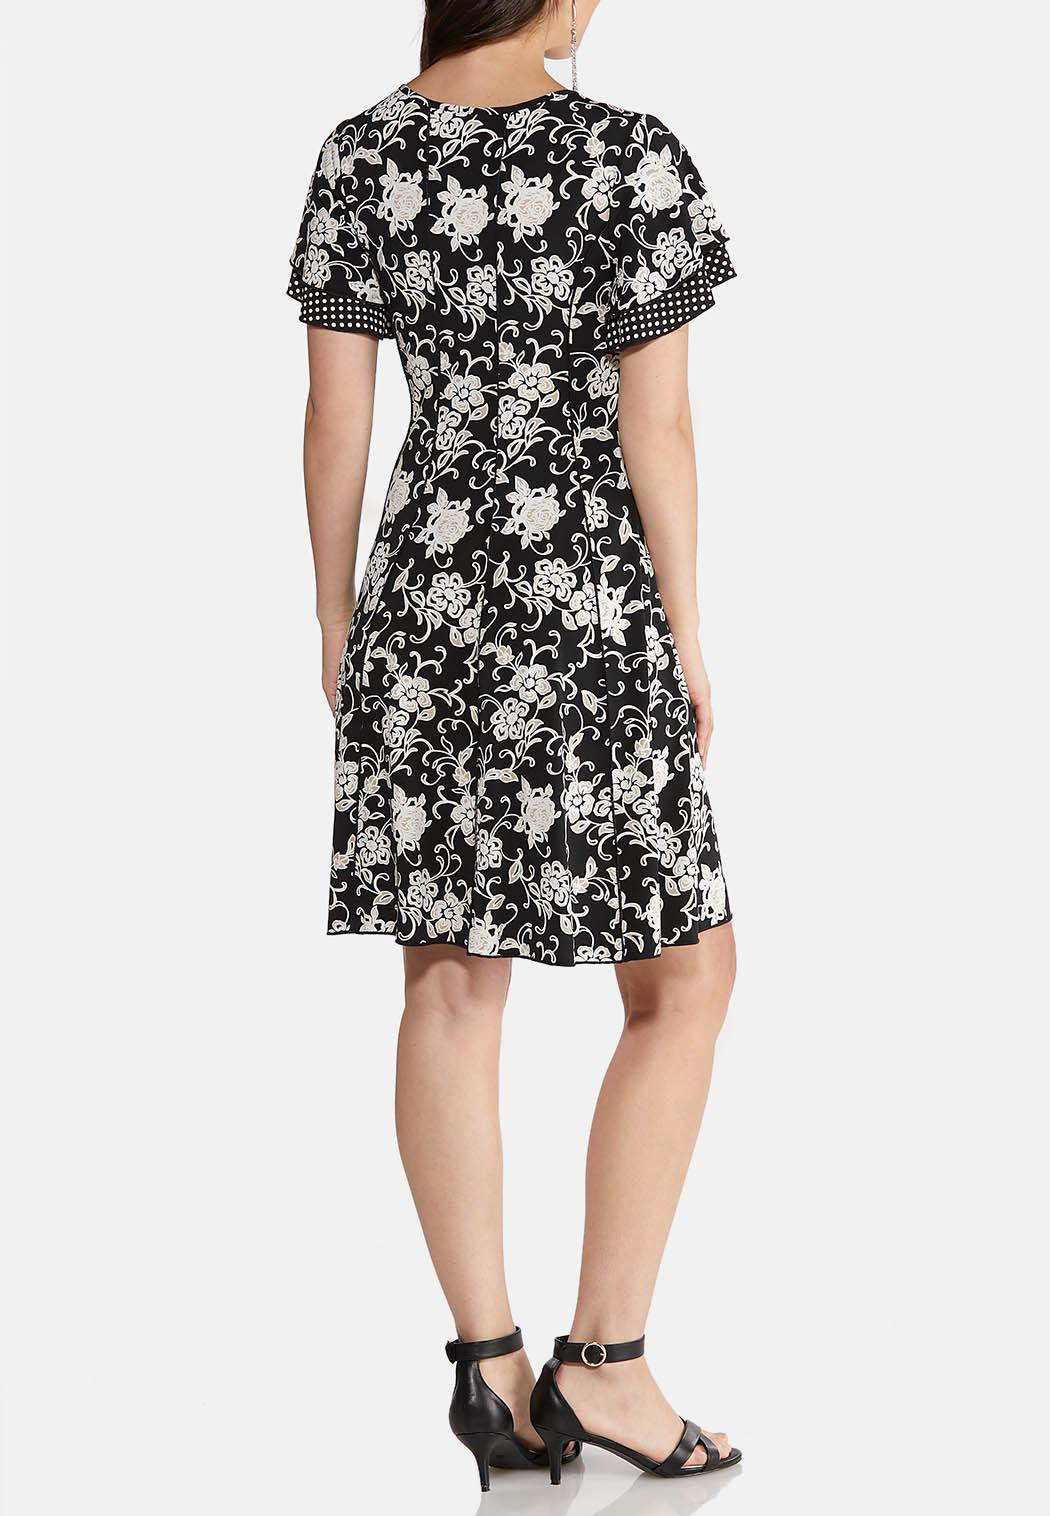 Floral Dot Puff Dress (Item #43896266)